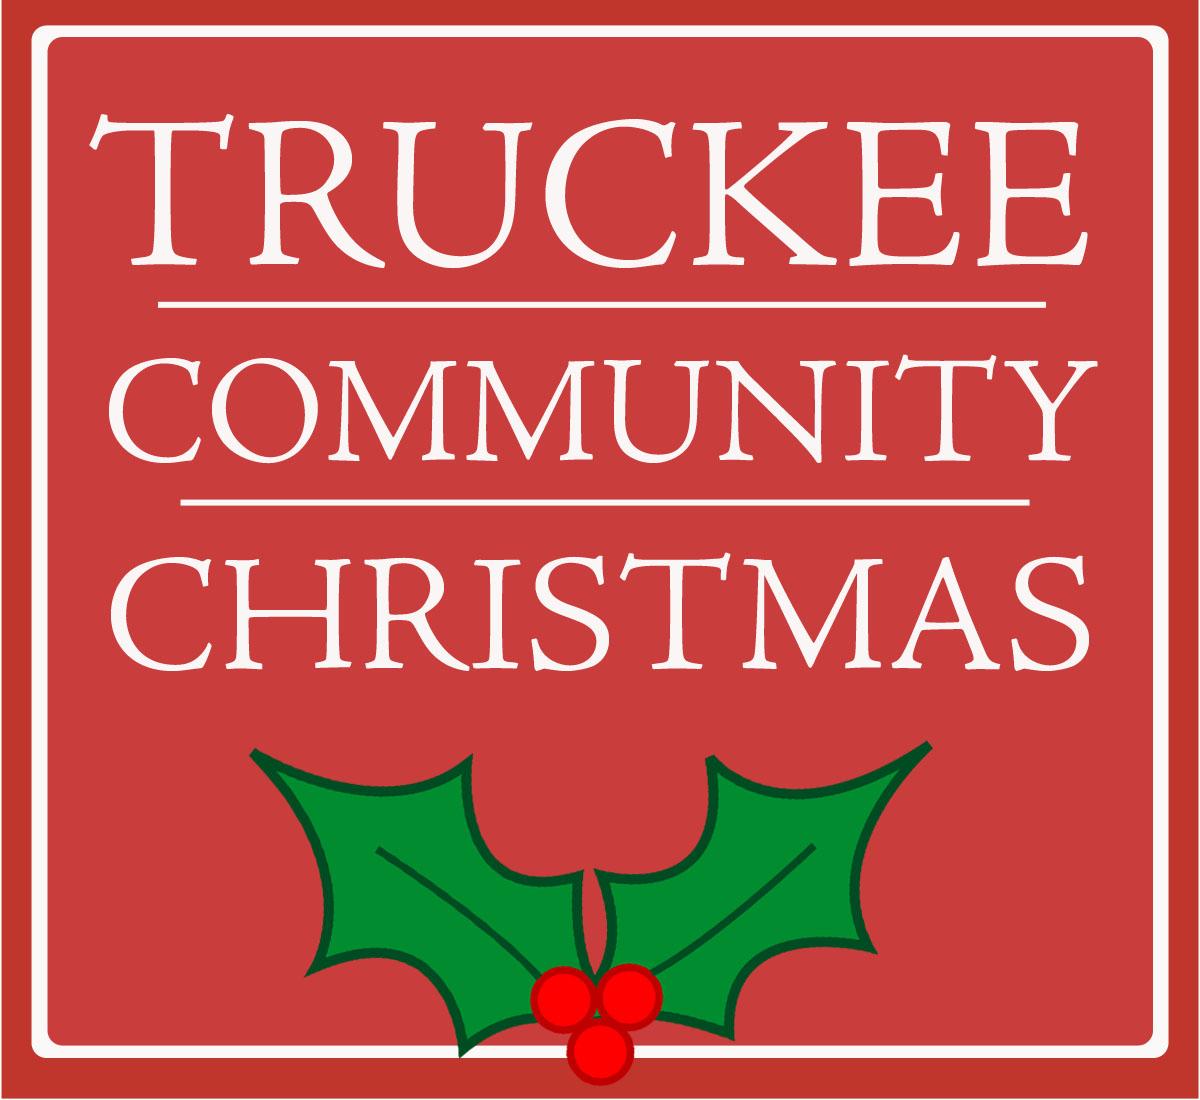 Truckee Community Christmas Logo.jpg